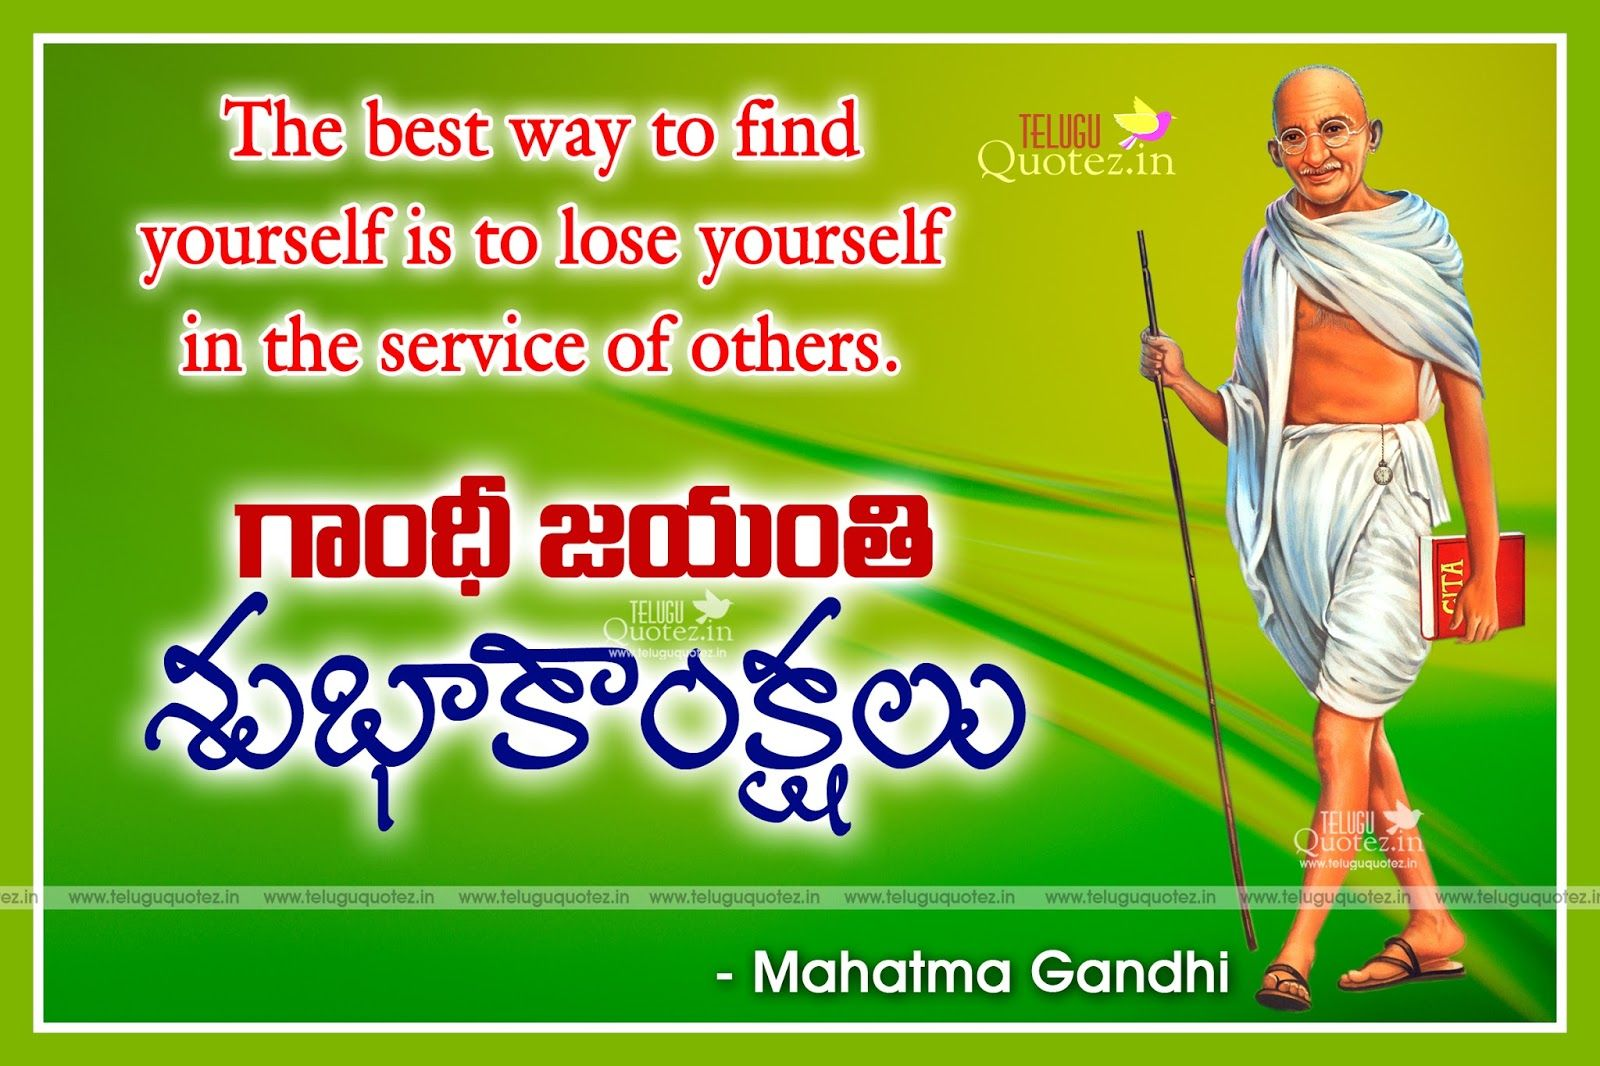 Happy Gandhi Jayanthi Telugu Quotes And Greetings Hd Images Free